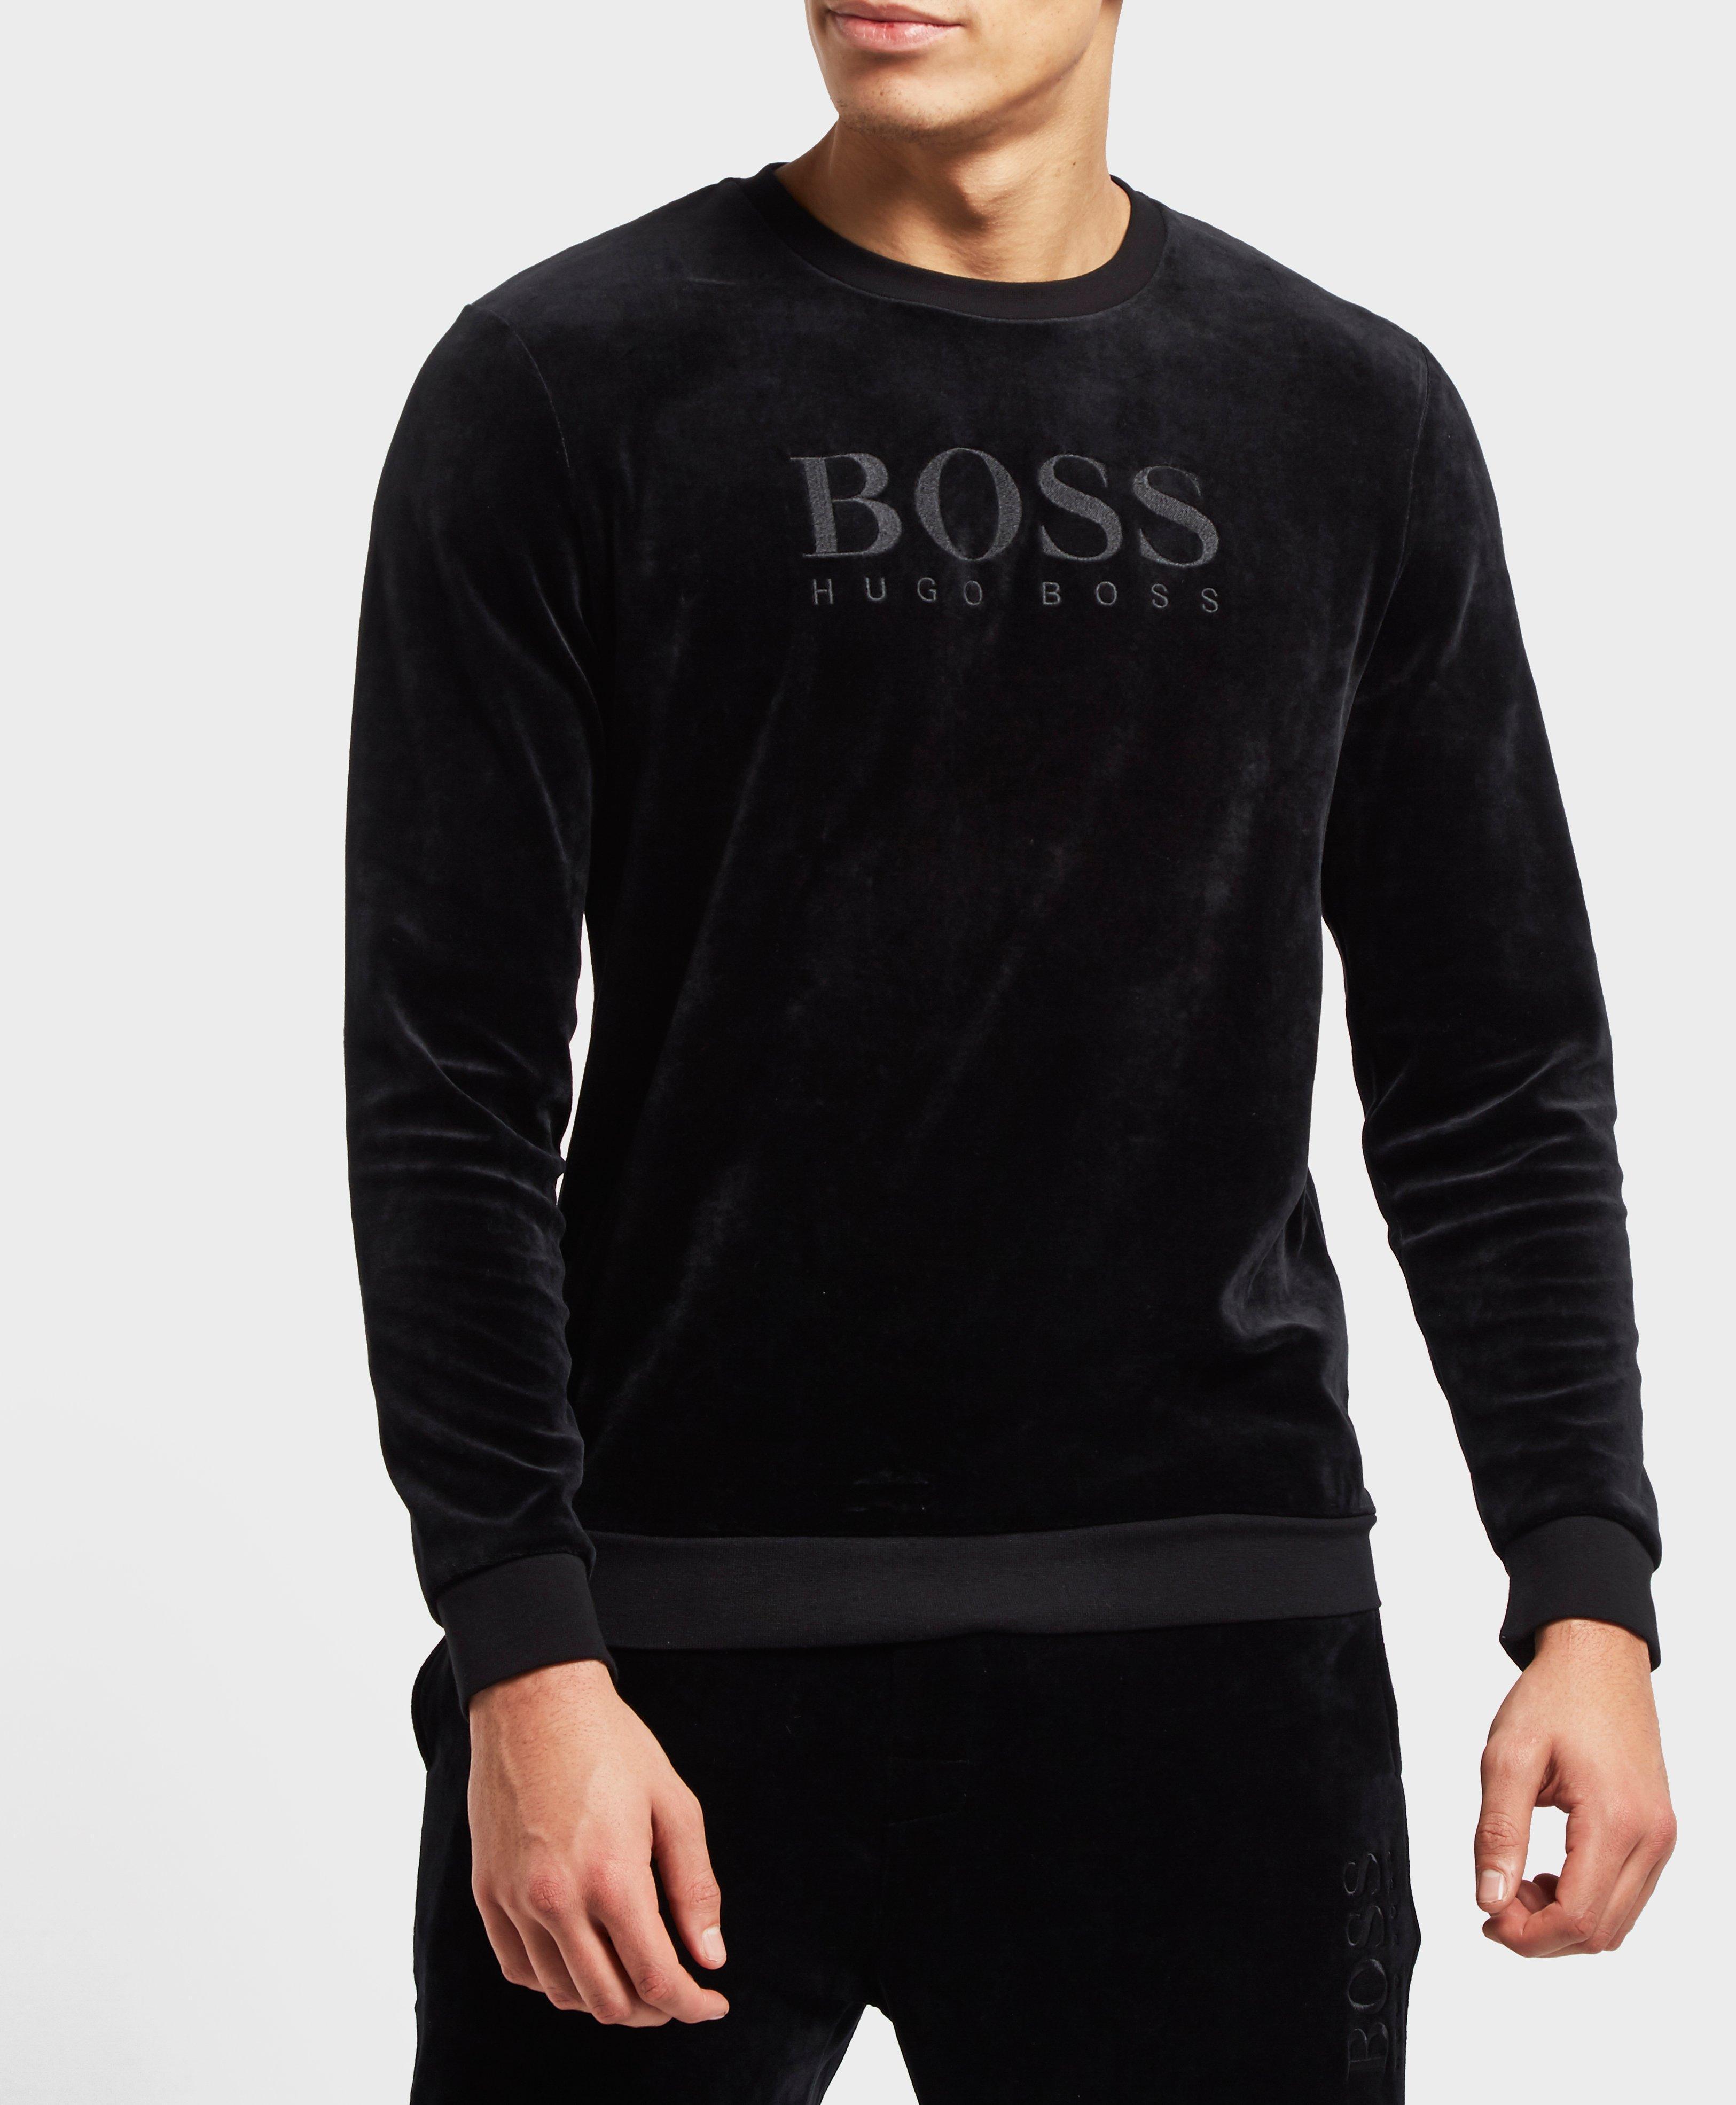 f5410c37 Clothing, Shoes & Jewelry BOSS Authentic Crew Neck Sweat Top in Black HUGO  BOSS AUTHENTIC SWEATSHIRT 50392056